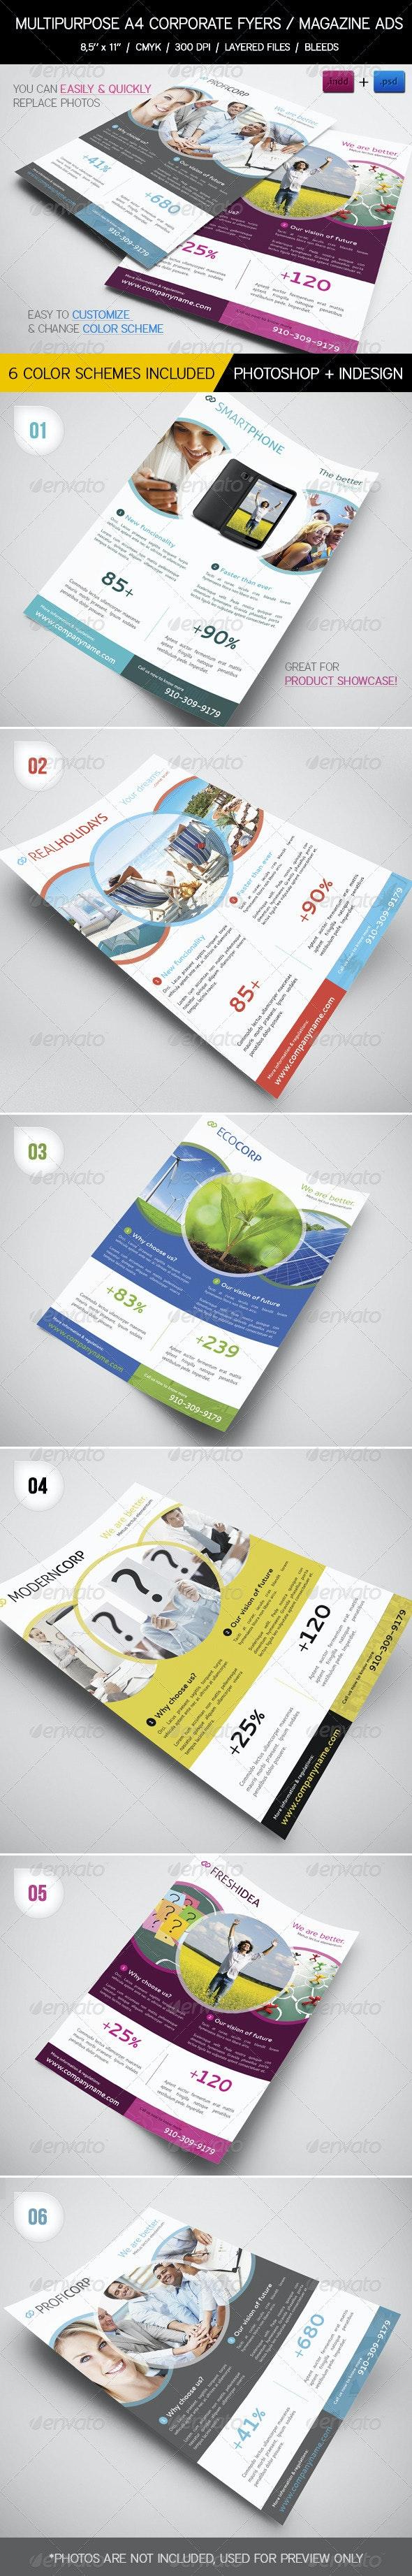 Multipurpose Business Flyers / Magazine Ads - Corporate Flyers